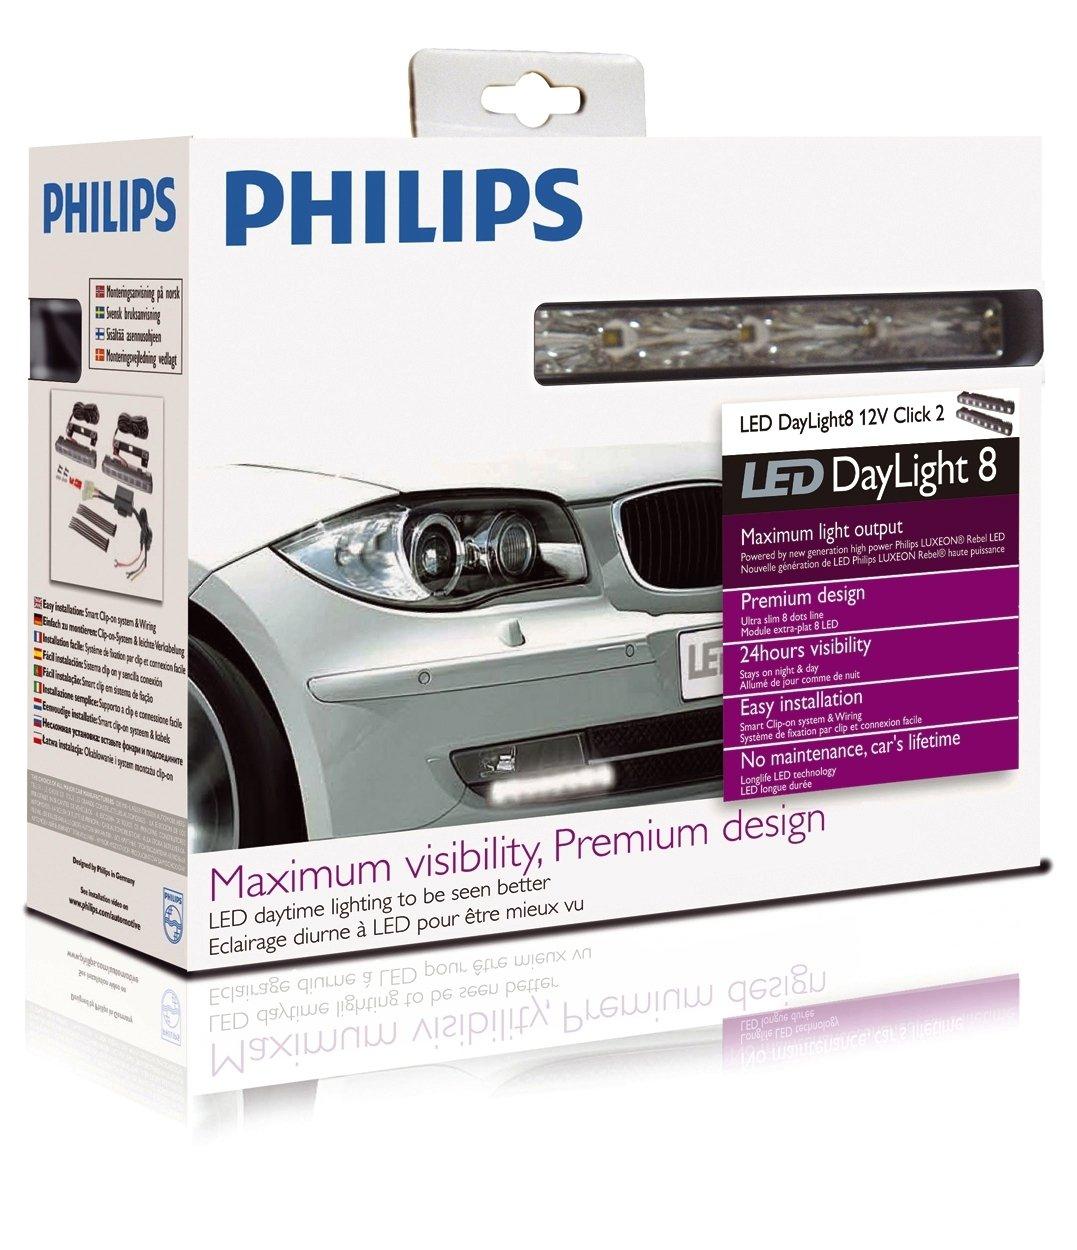 Philips 12824wlvwac1 Daylight 8 Gen 2 High Powered Phillips 7 Way Wiring Diagram Luxeon Led Daytime Running Light Automotive